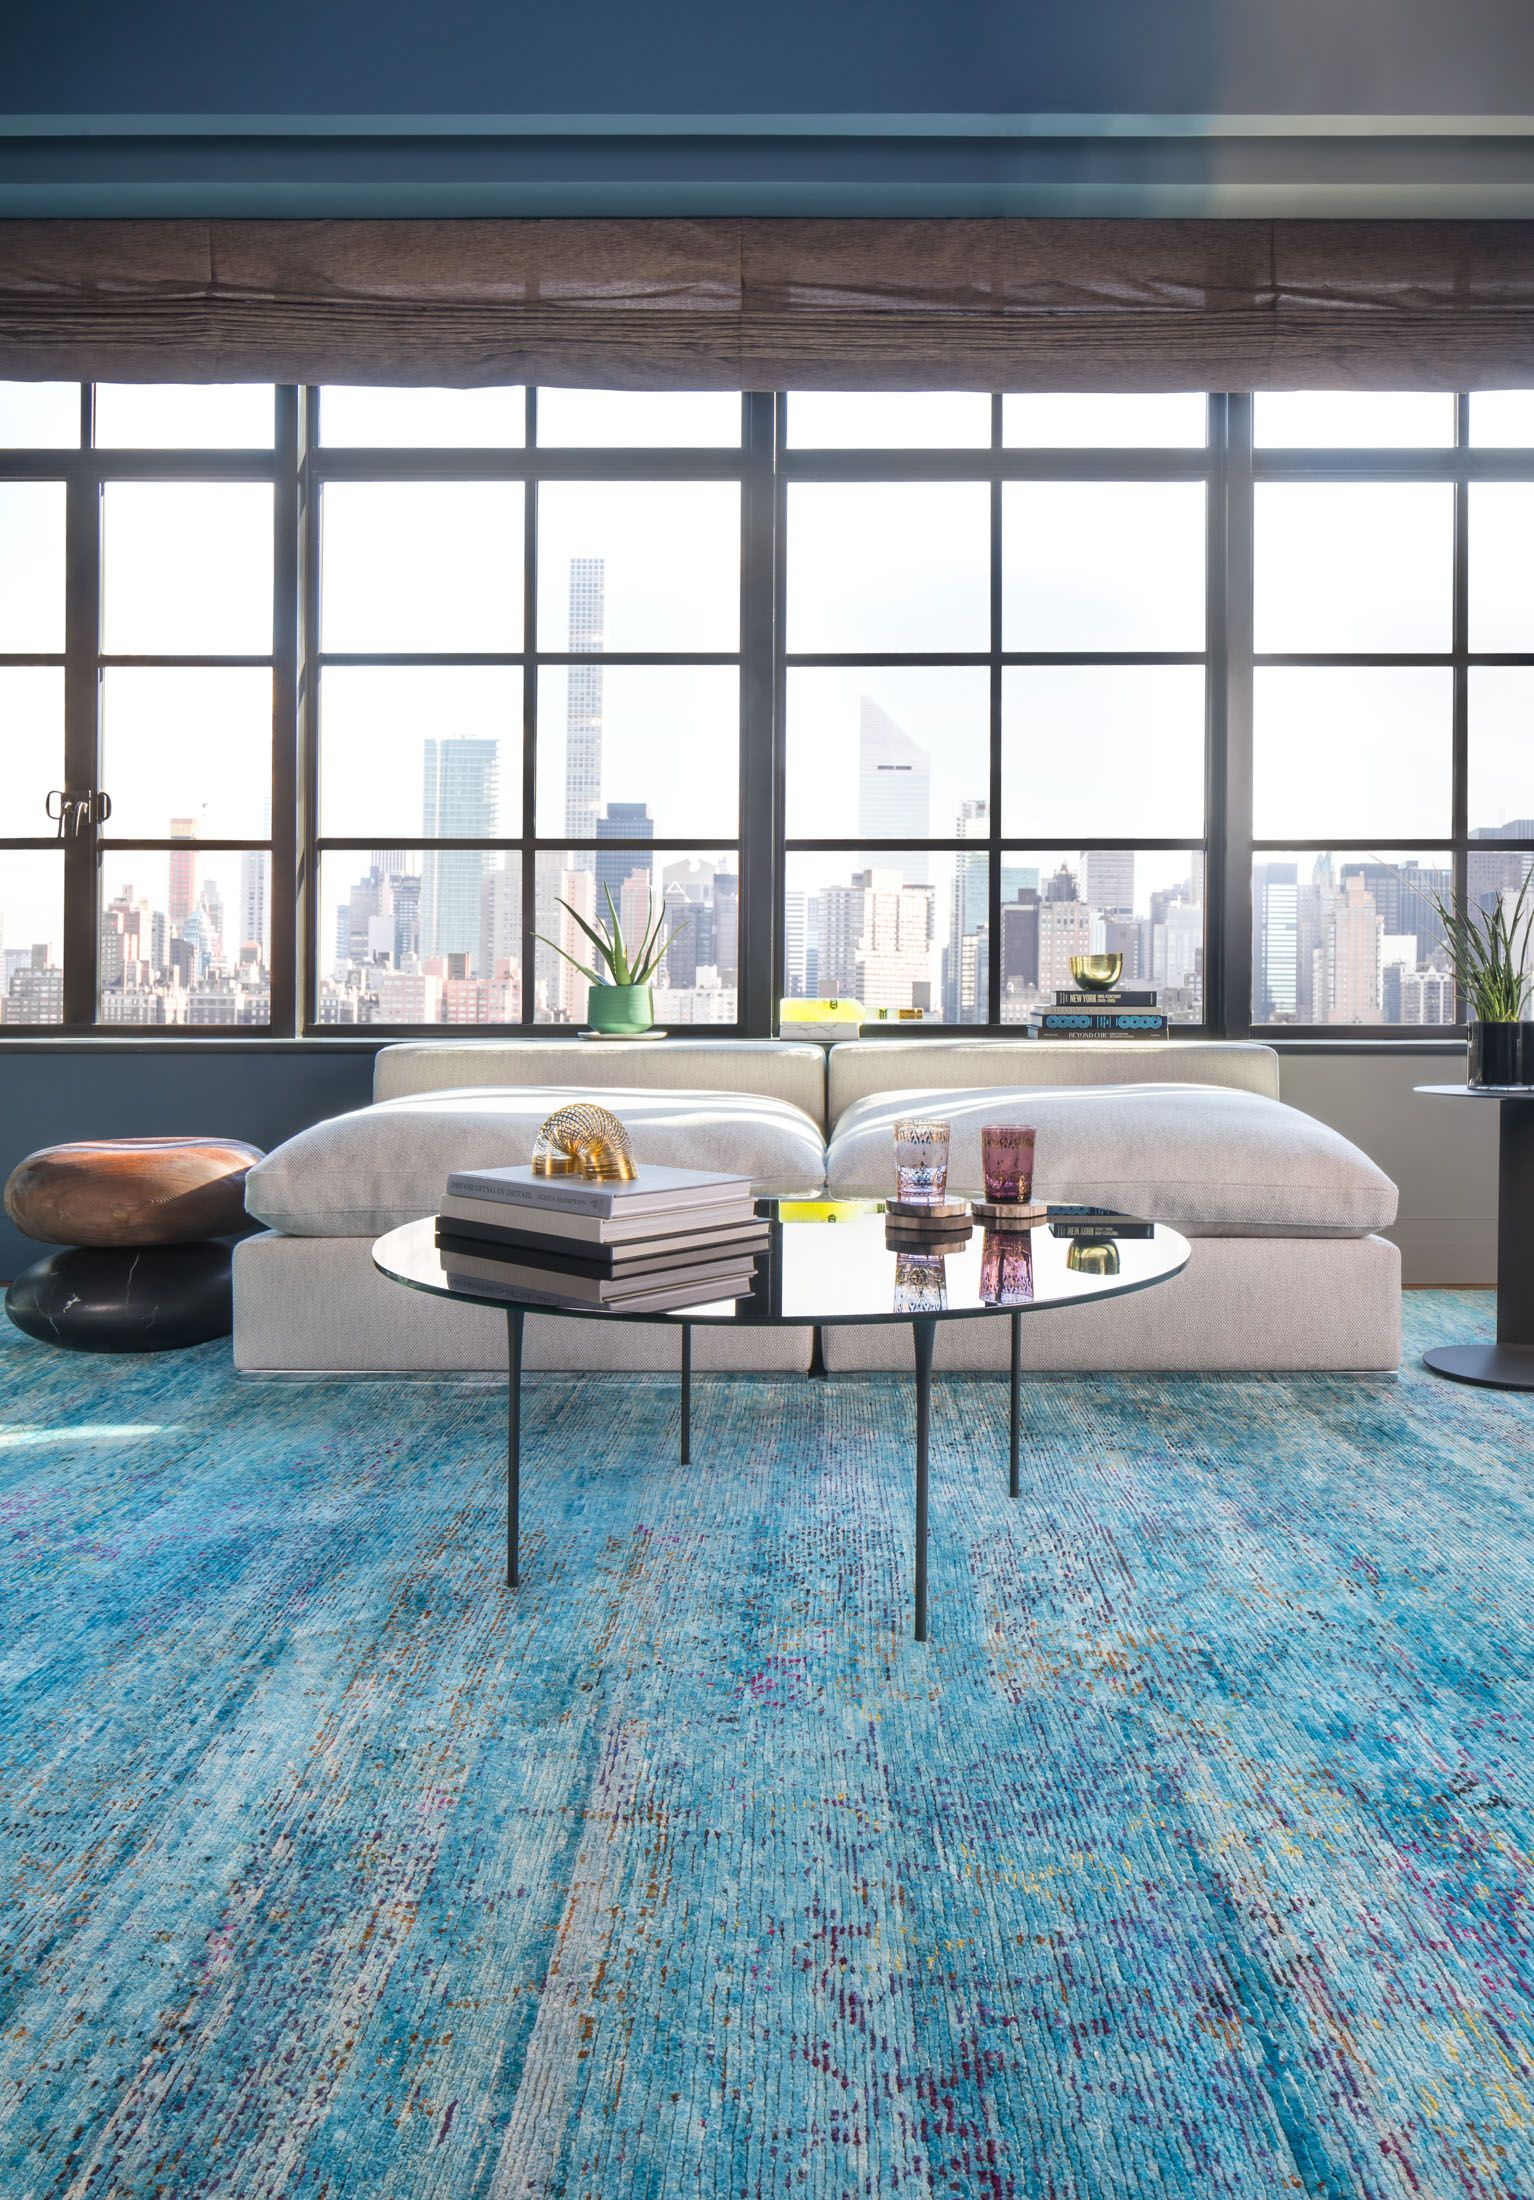 Kerwin Teal - Sapphire Collection Vol 2 - Stark Carpet